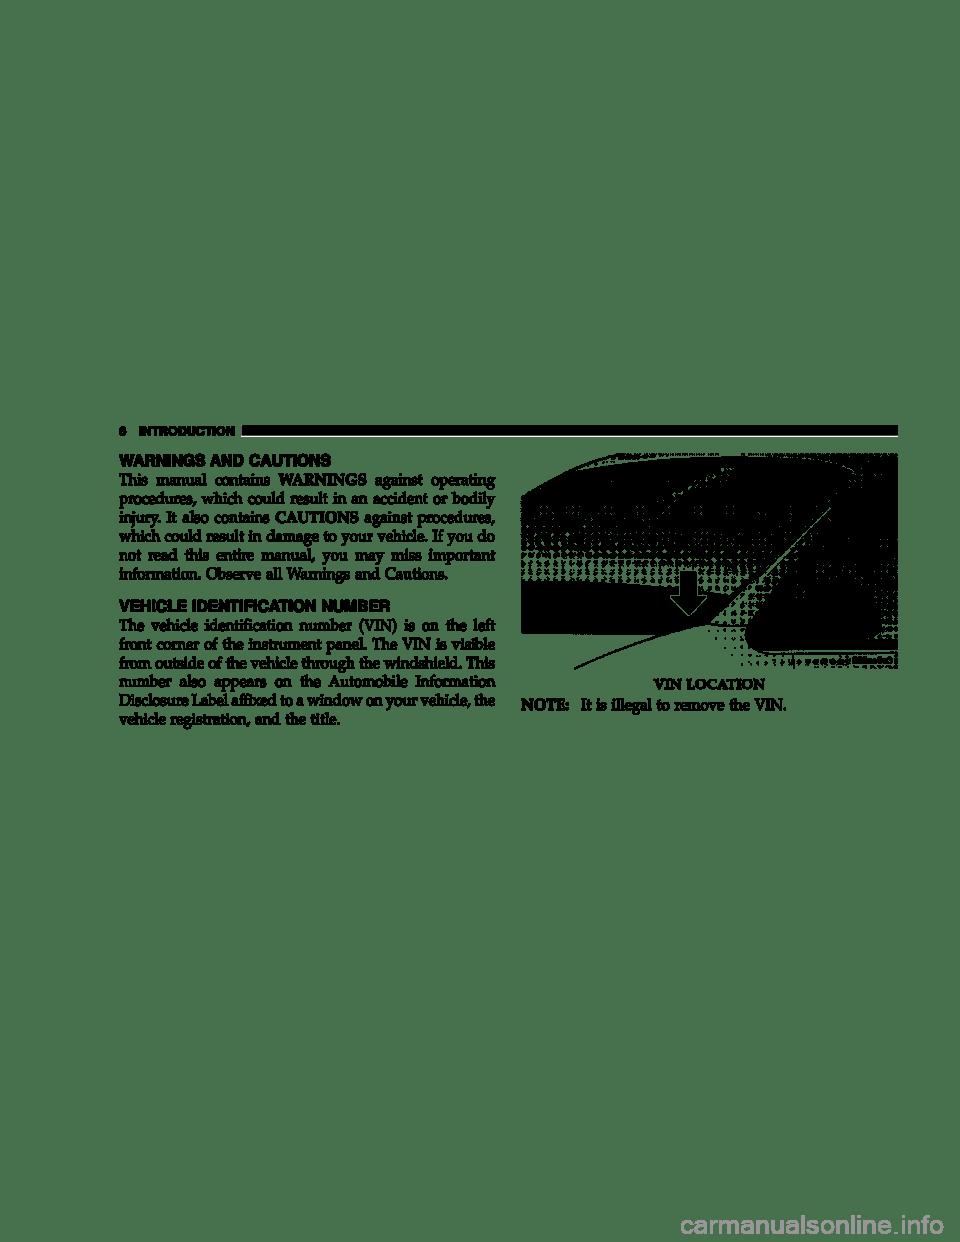 2000 kia sephia engine diagram intertherm heat pump wiring timing belt free for you 2004 buick lesabre repair manual imageresizertool com sedona